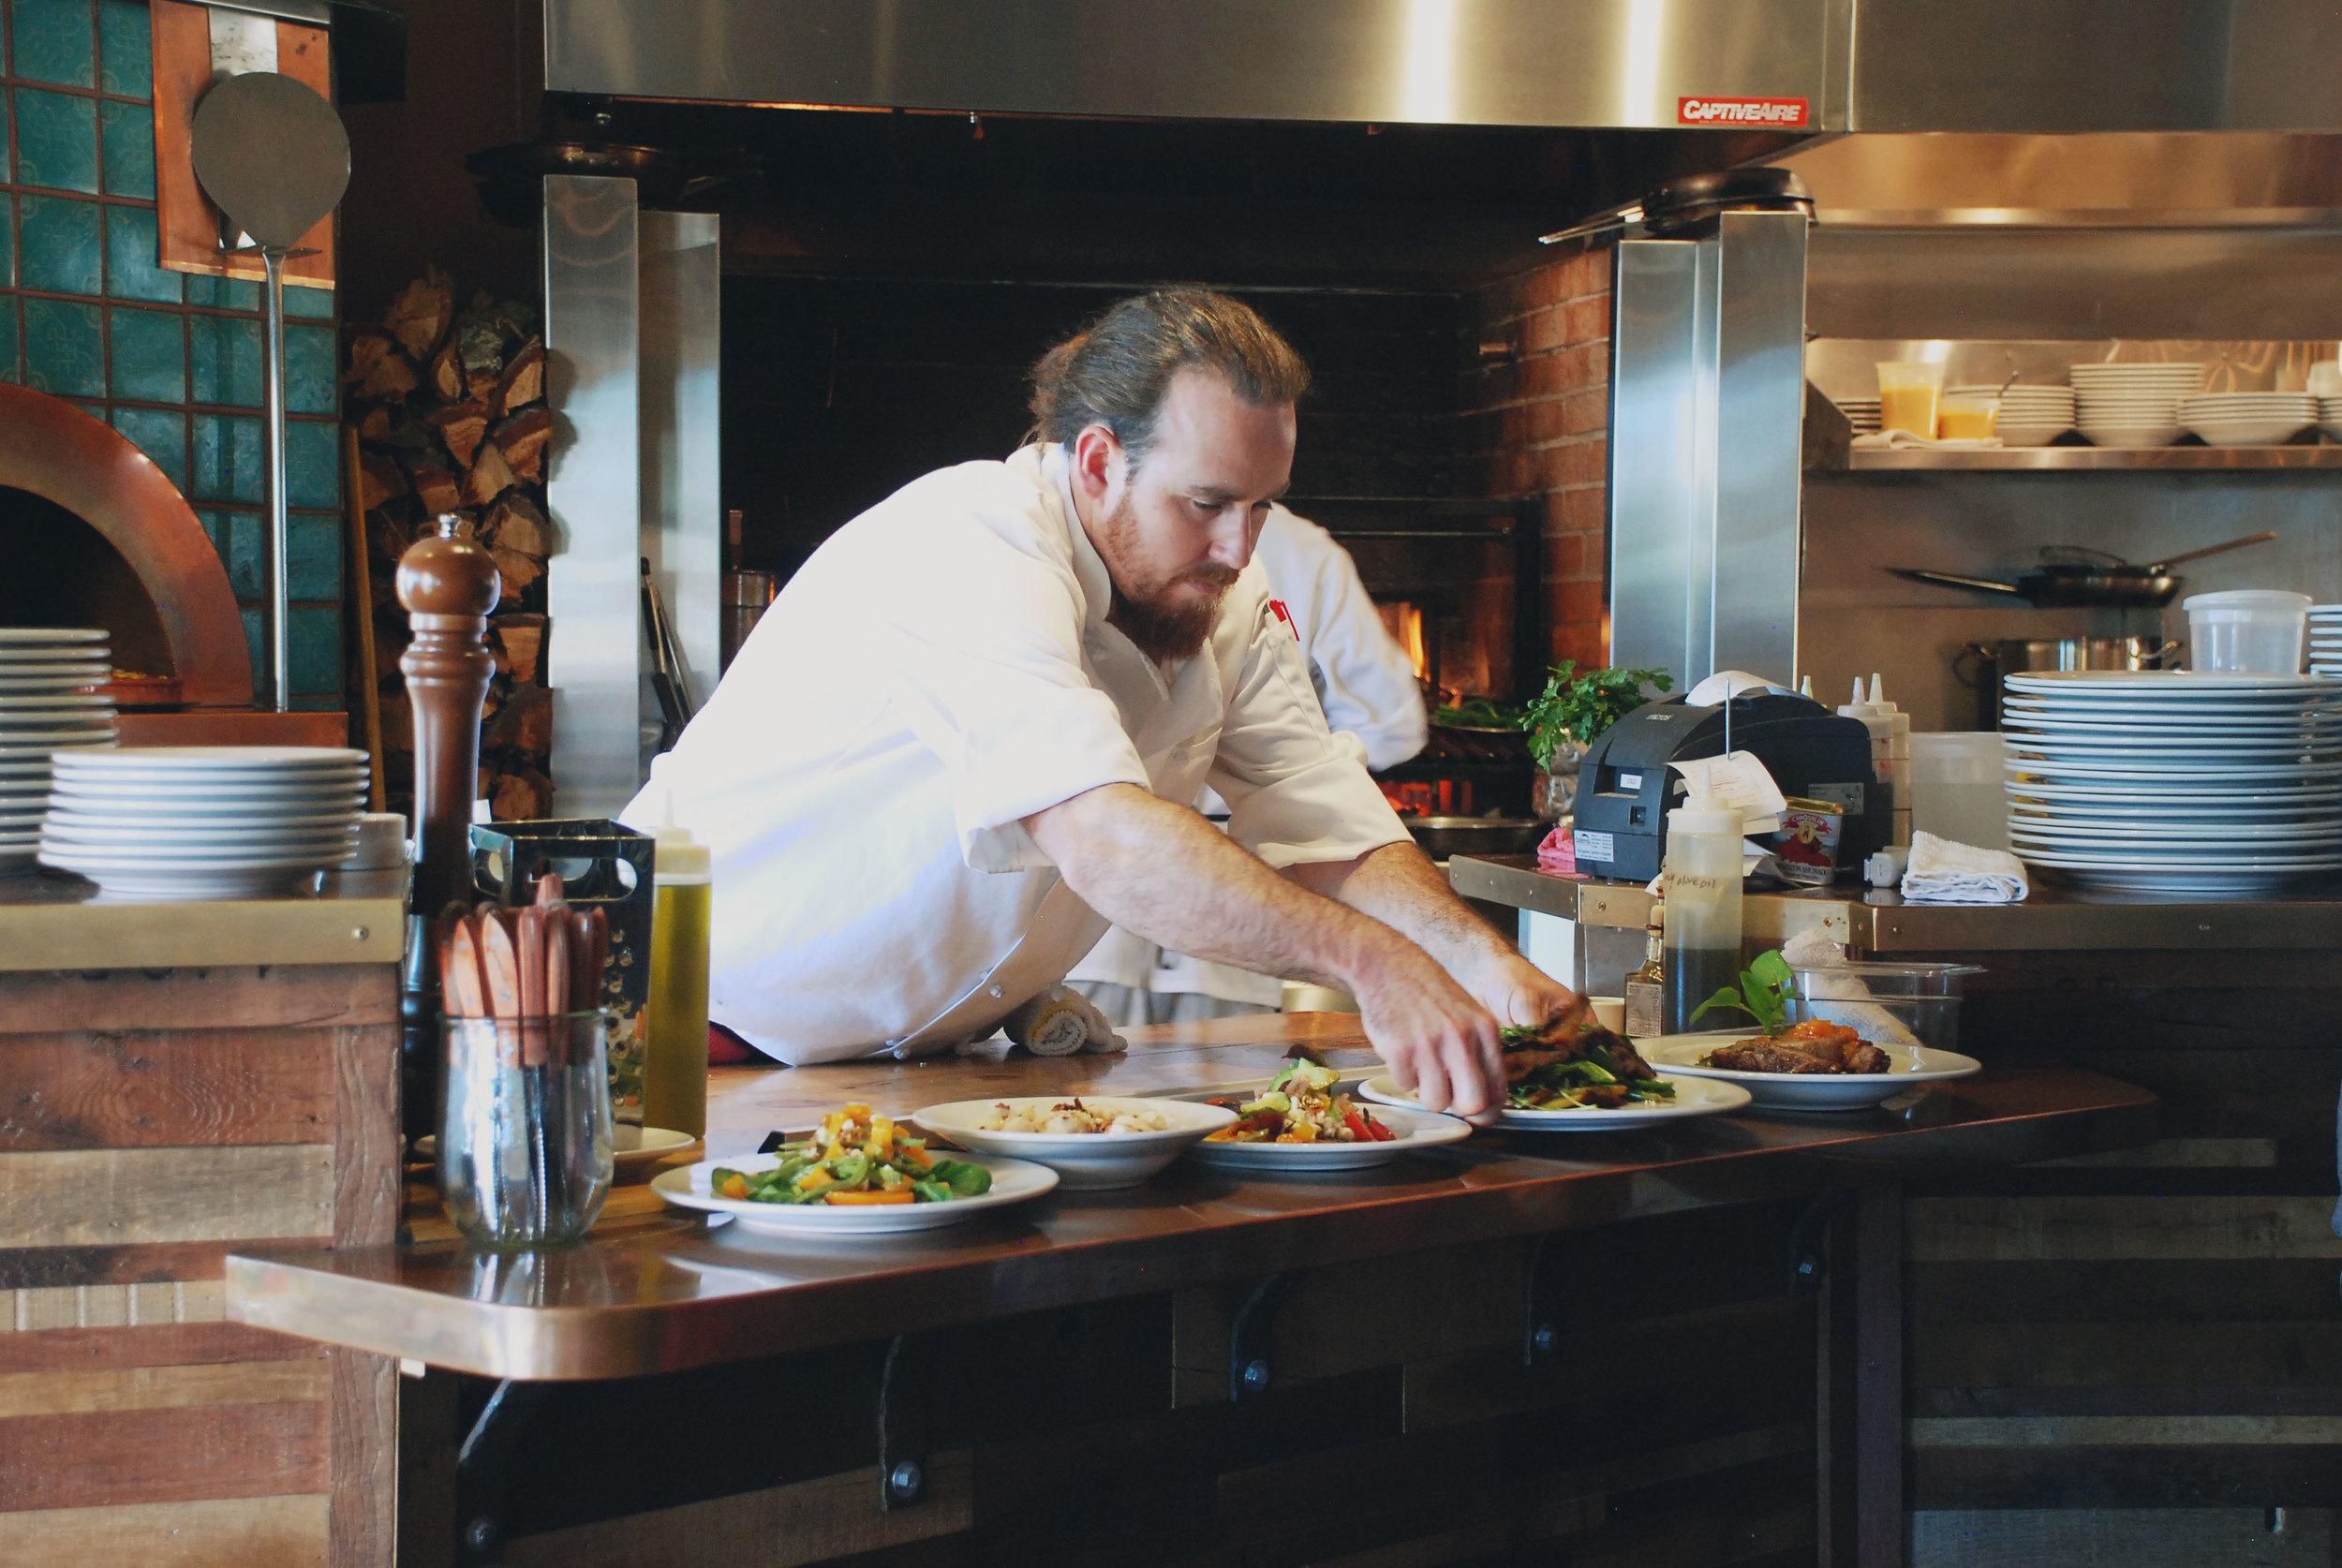 Ember Restaurant Arroyo Grande Featuring Wood Fired Honest Food